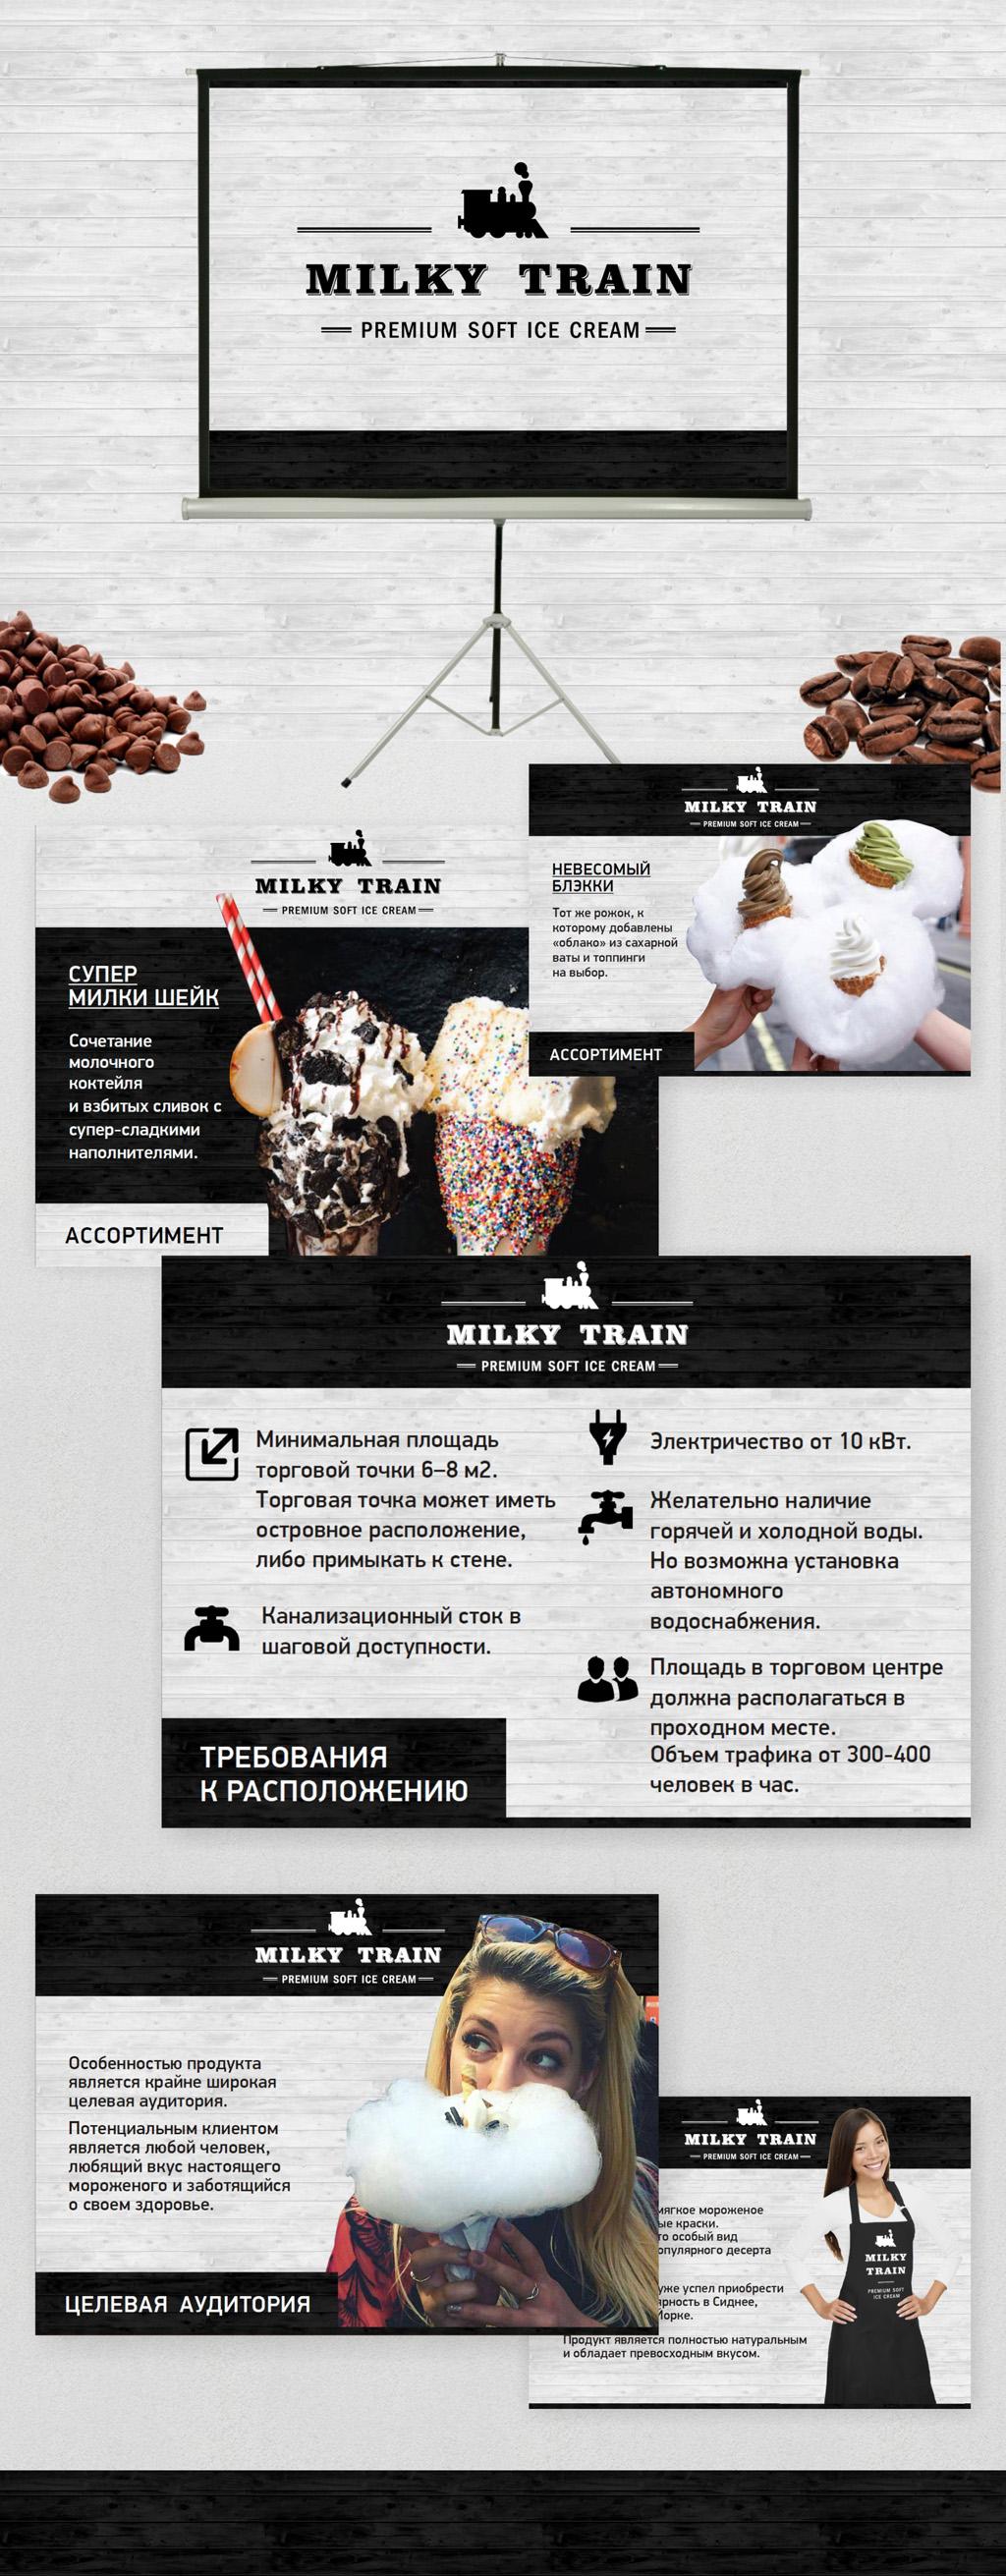 MILKY TRAIN